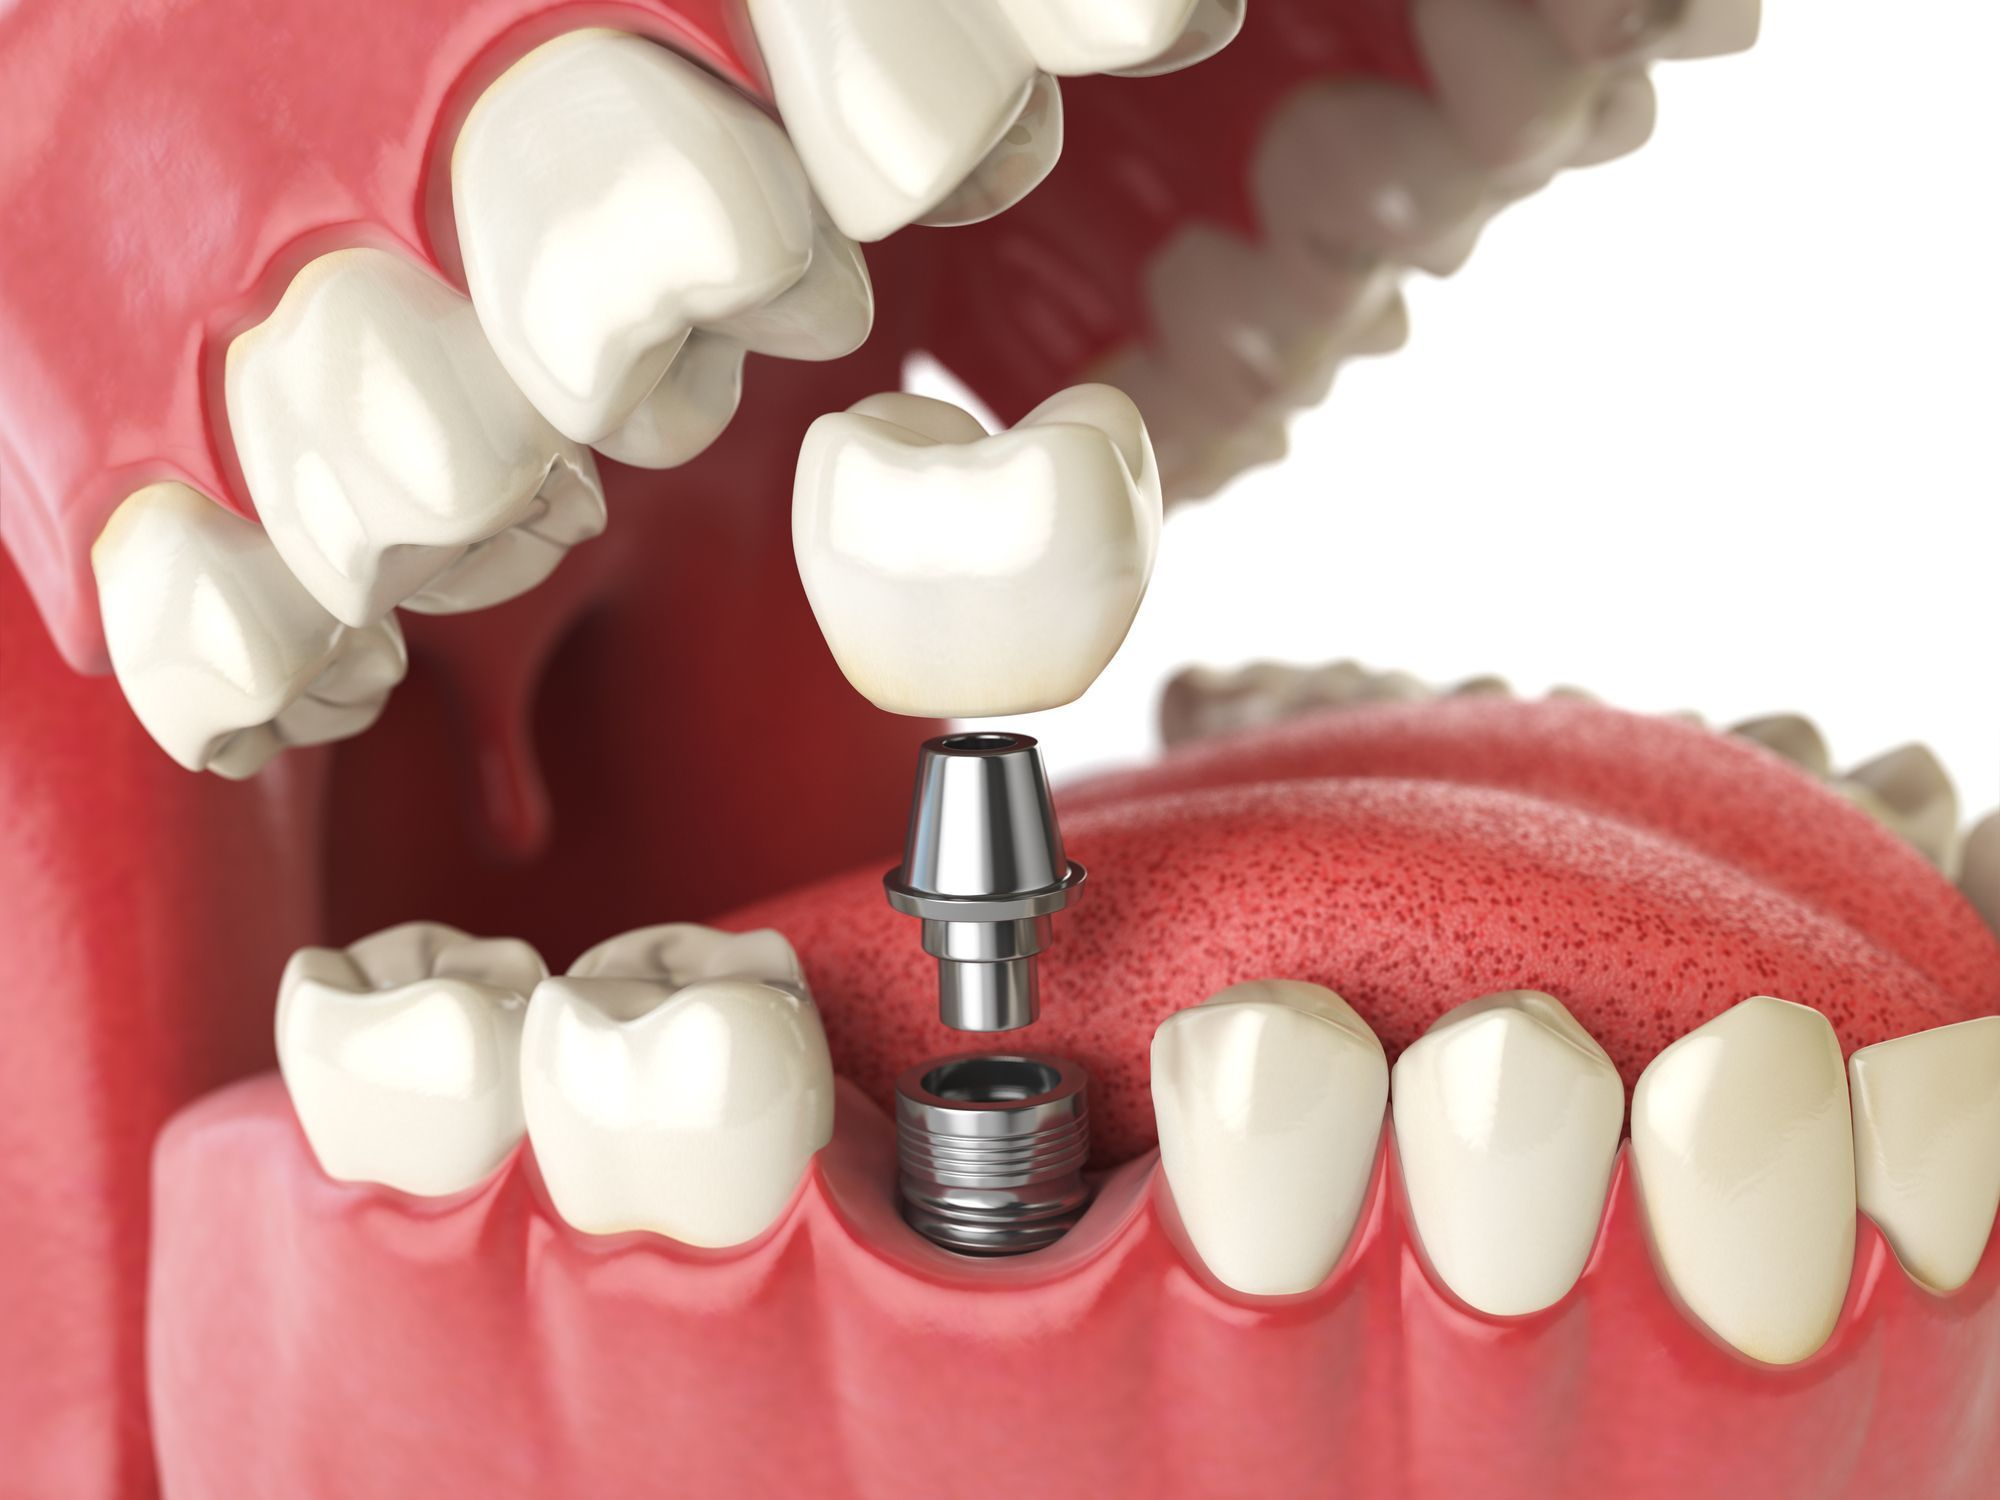 имплантация зубов фото 1